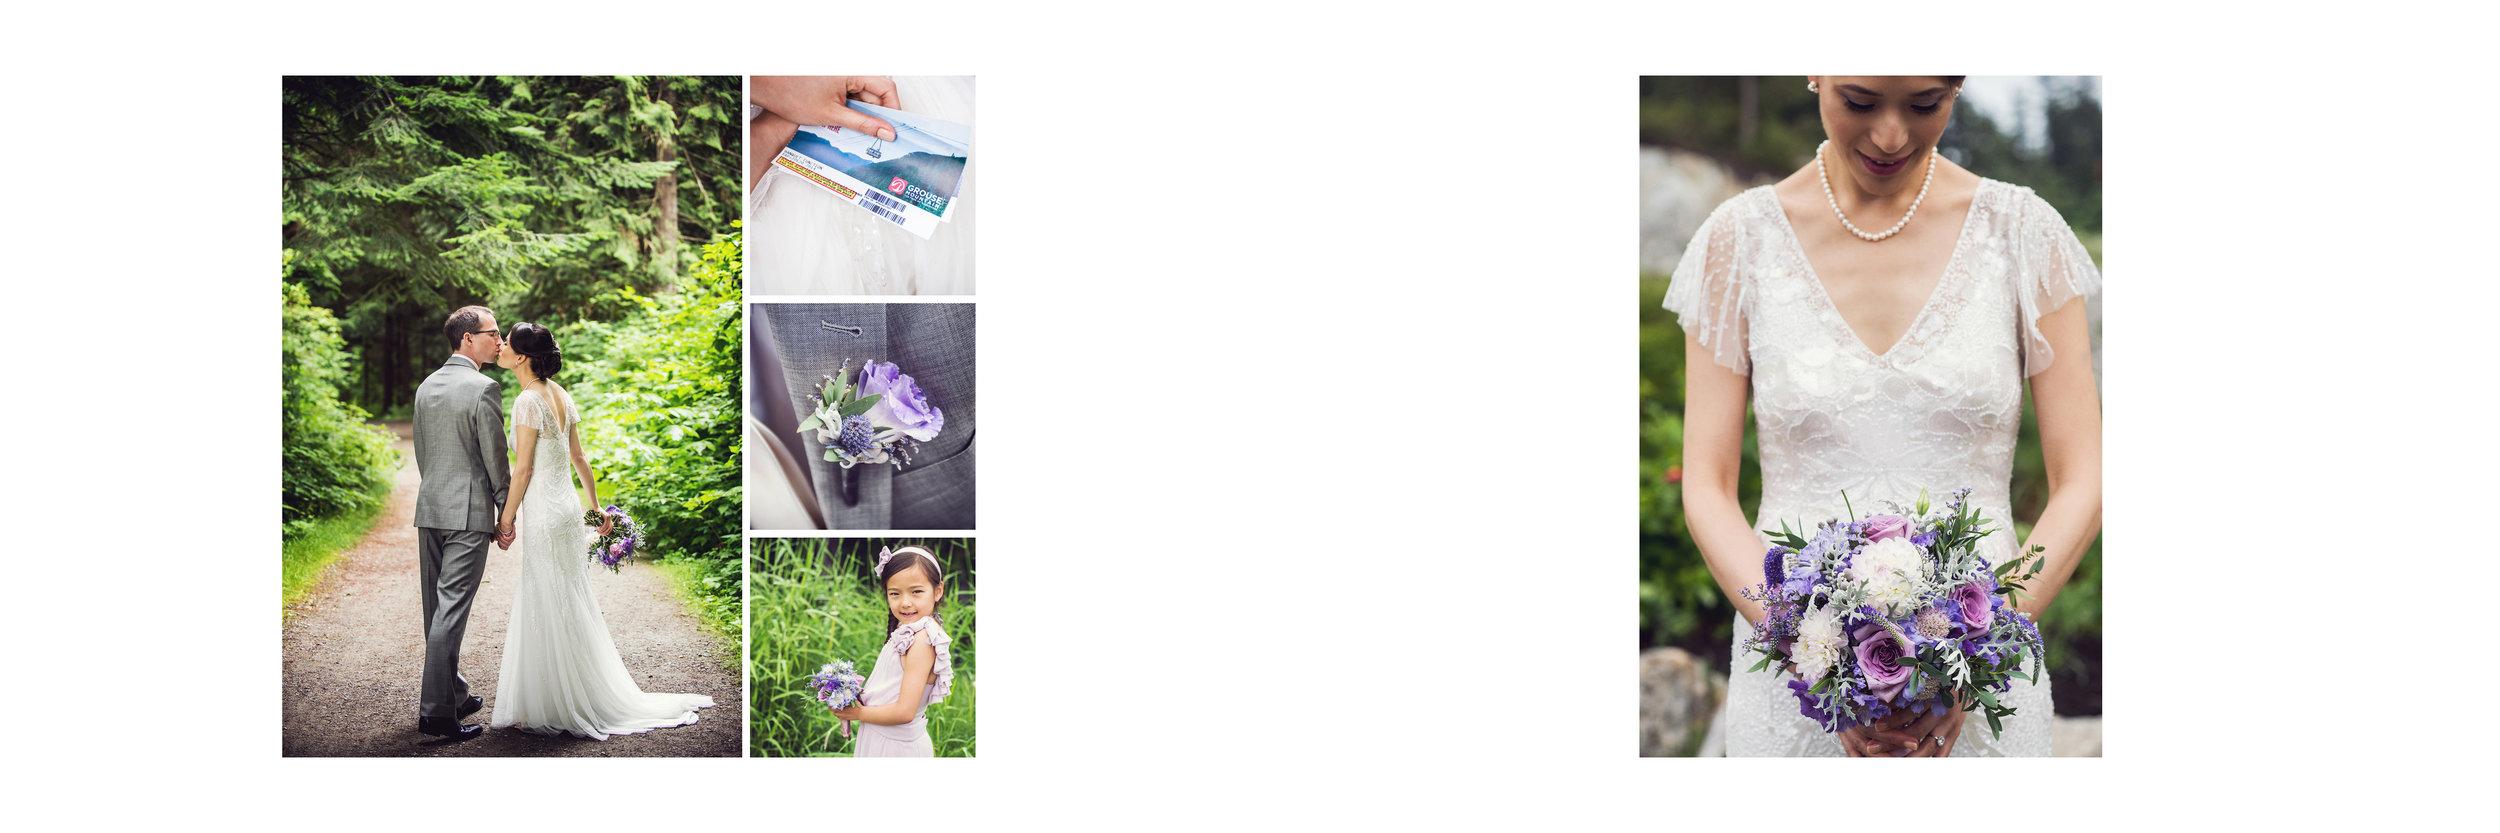 Andrea-Reuben-Grouse-Mountain-Wedding-Real-Weddings-Feature-Yaletown-Photography-010.jpg